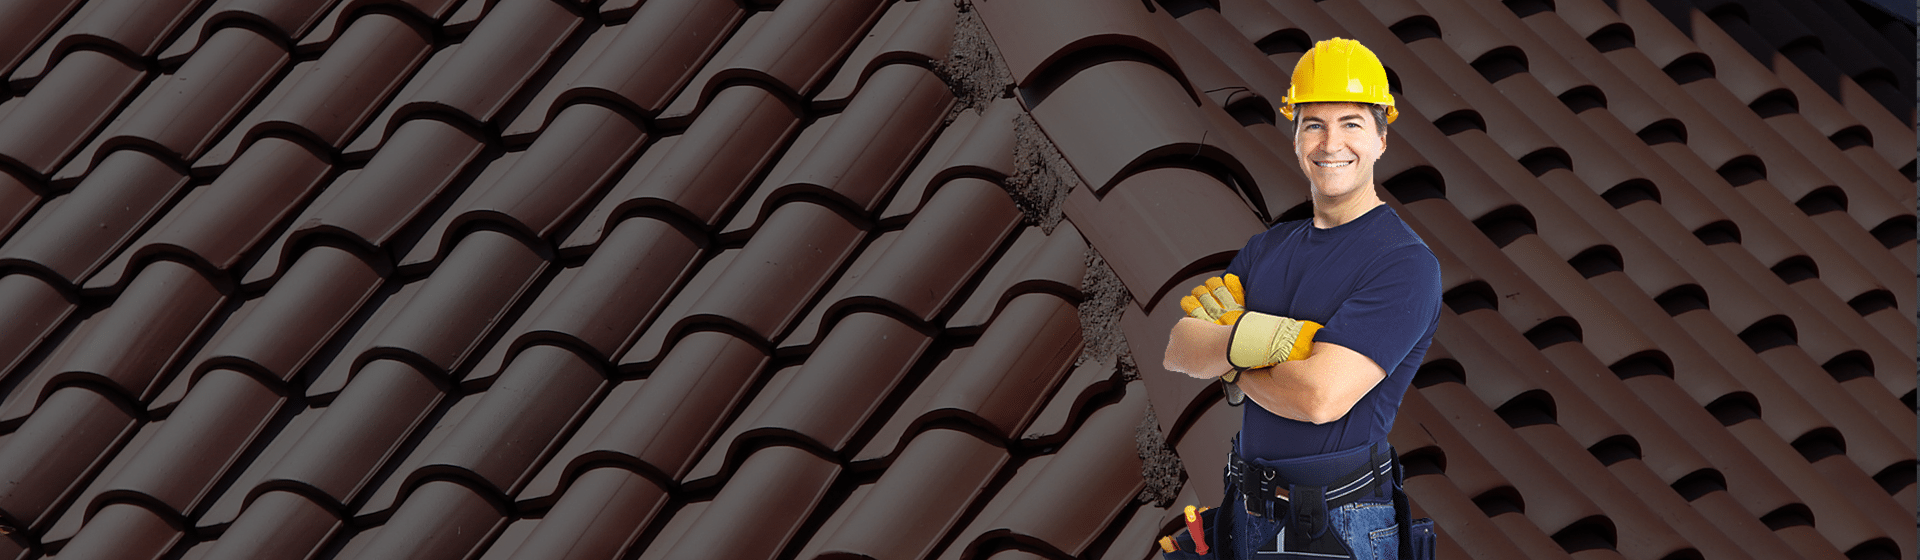 tile roof service